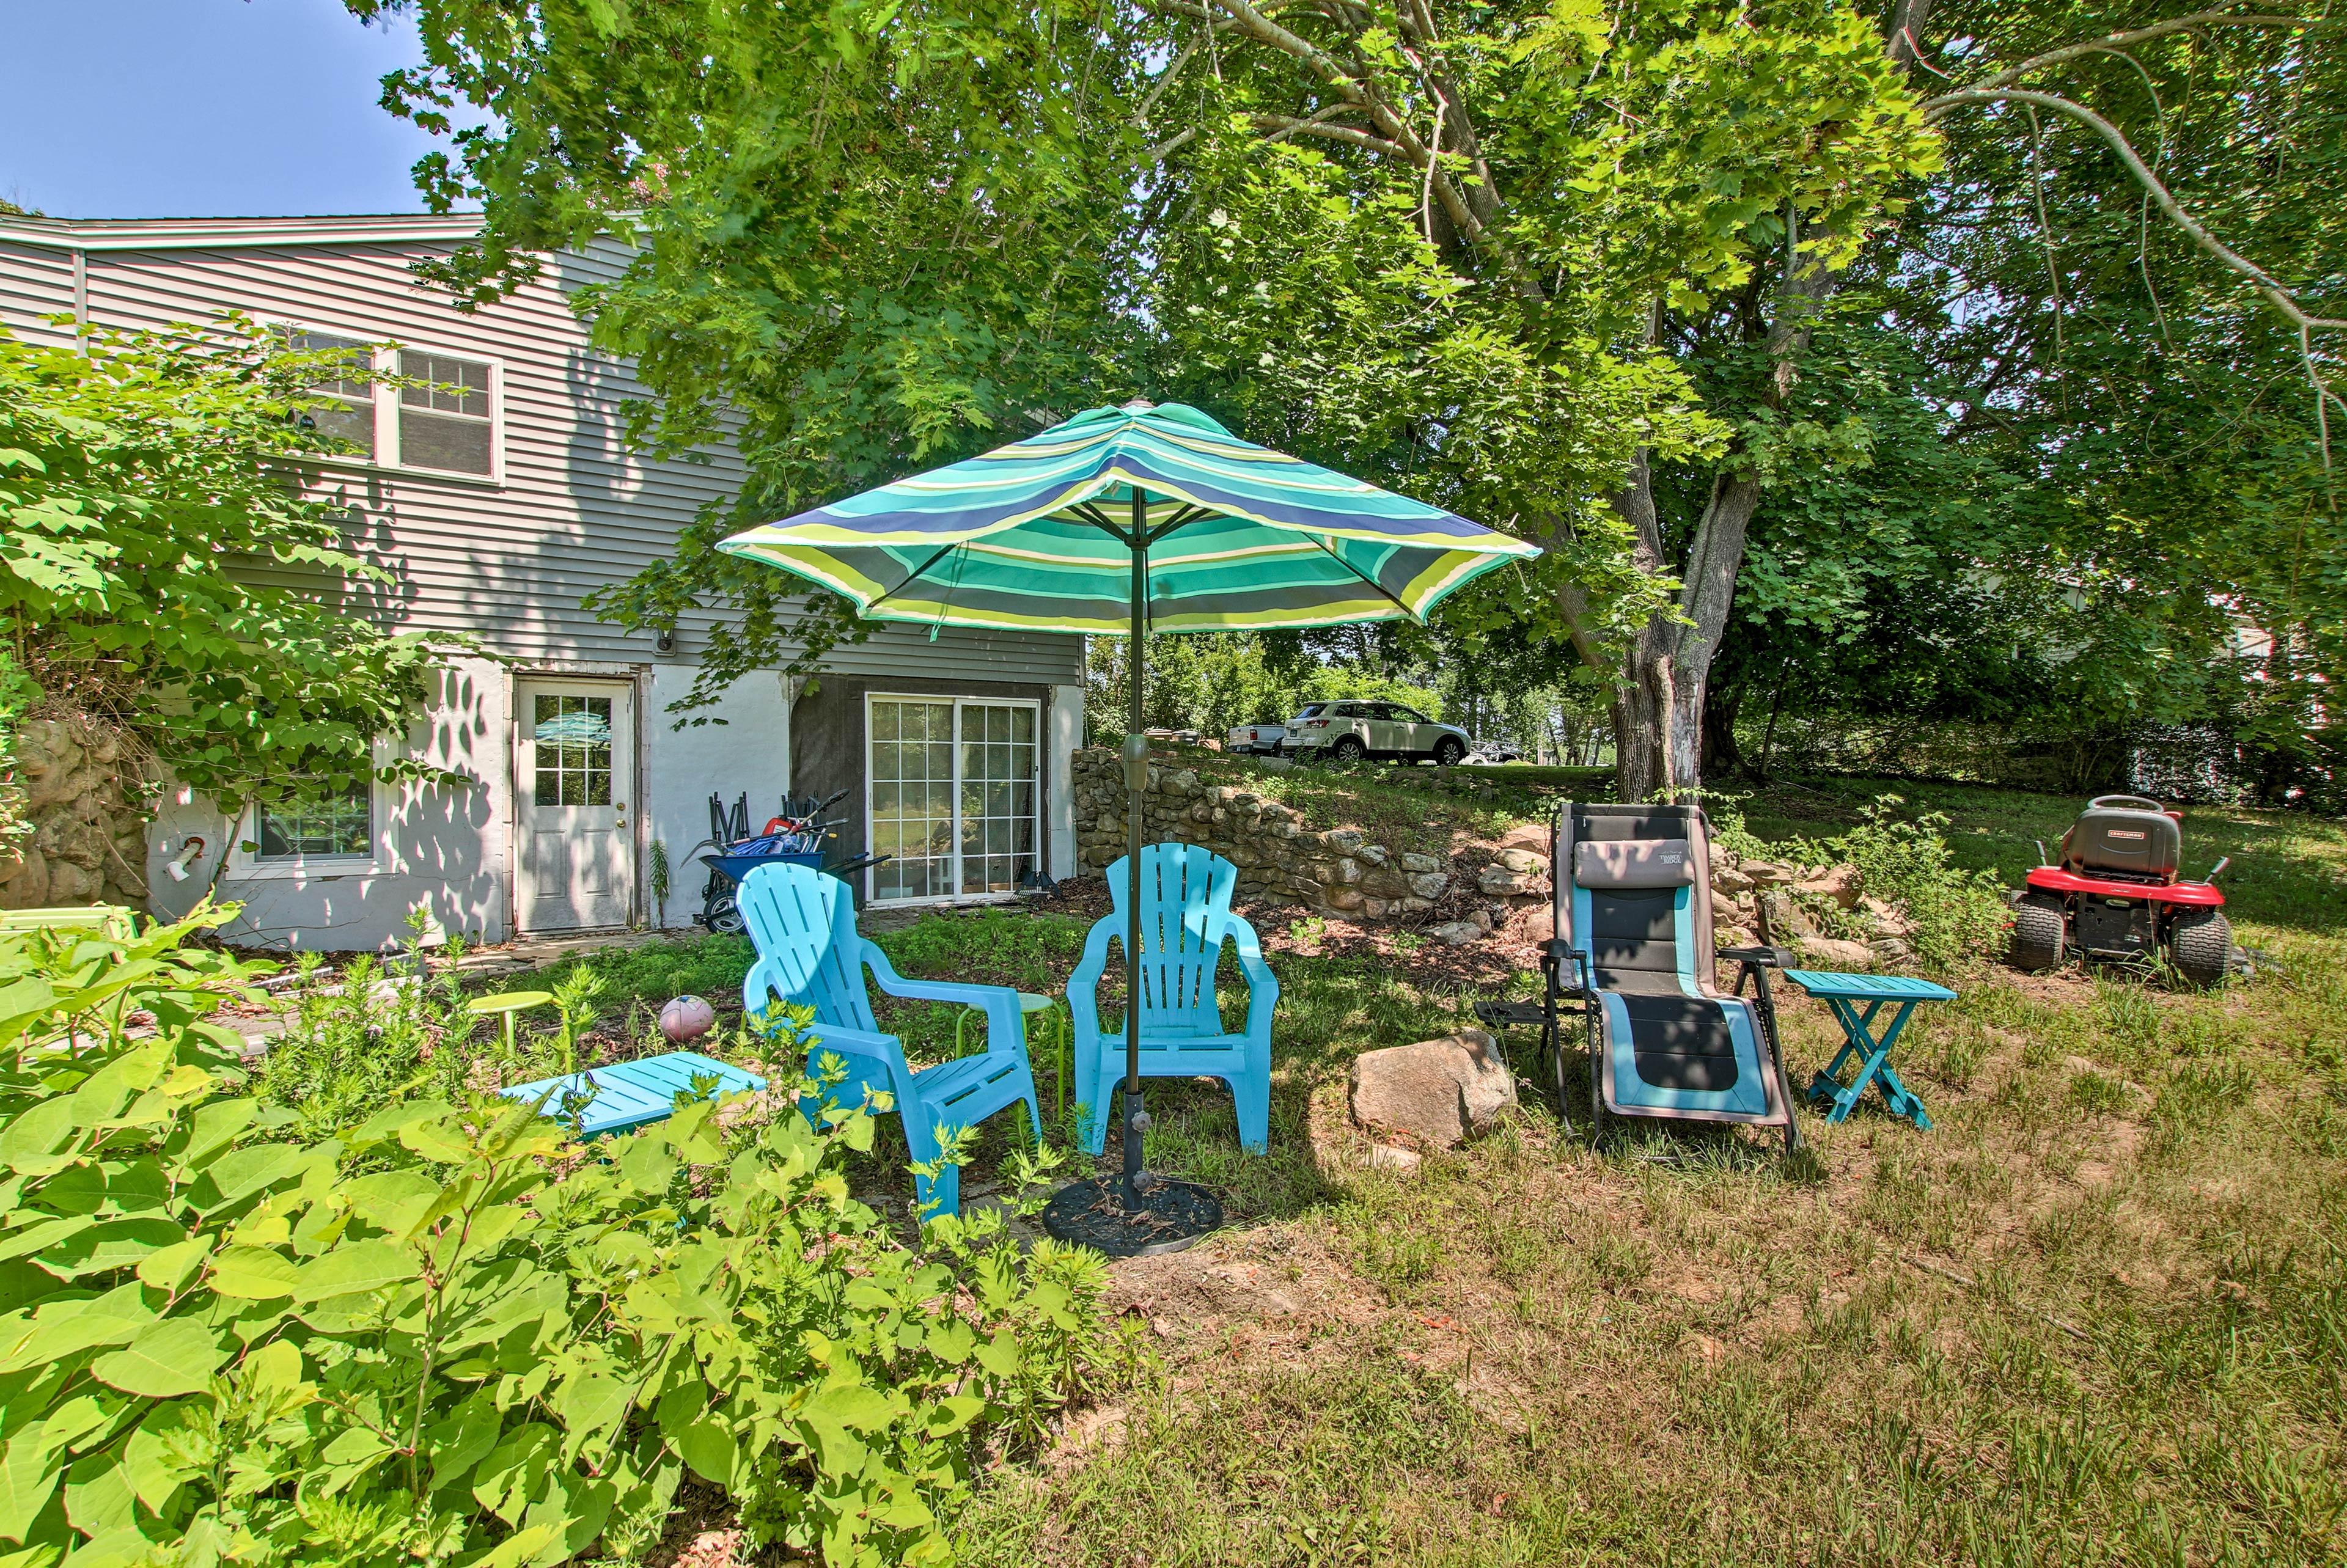 Perfect your tan in the yard.